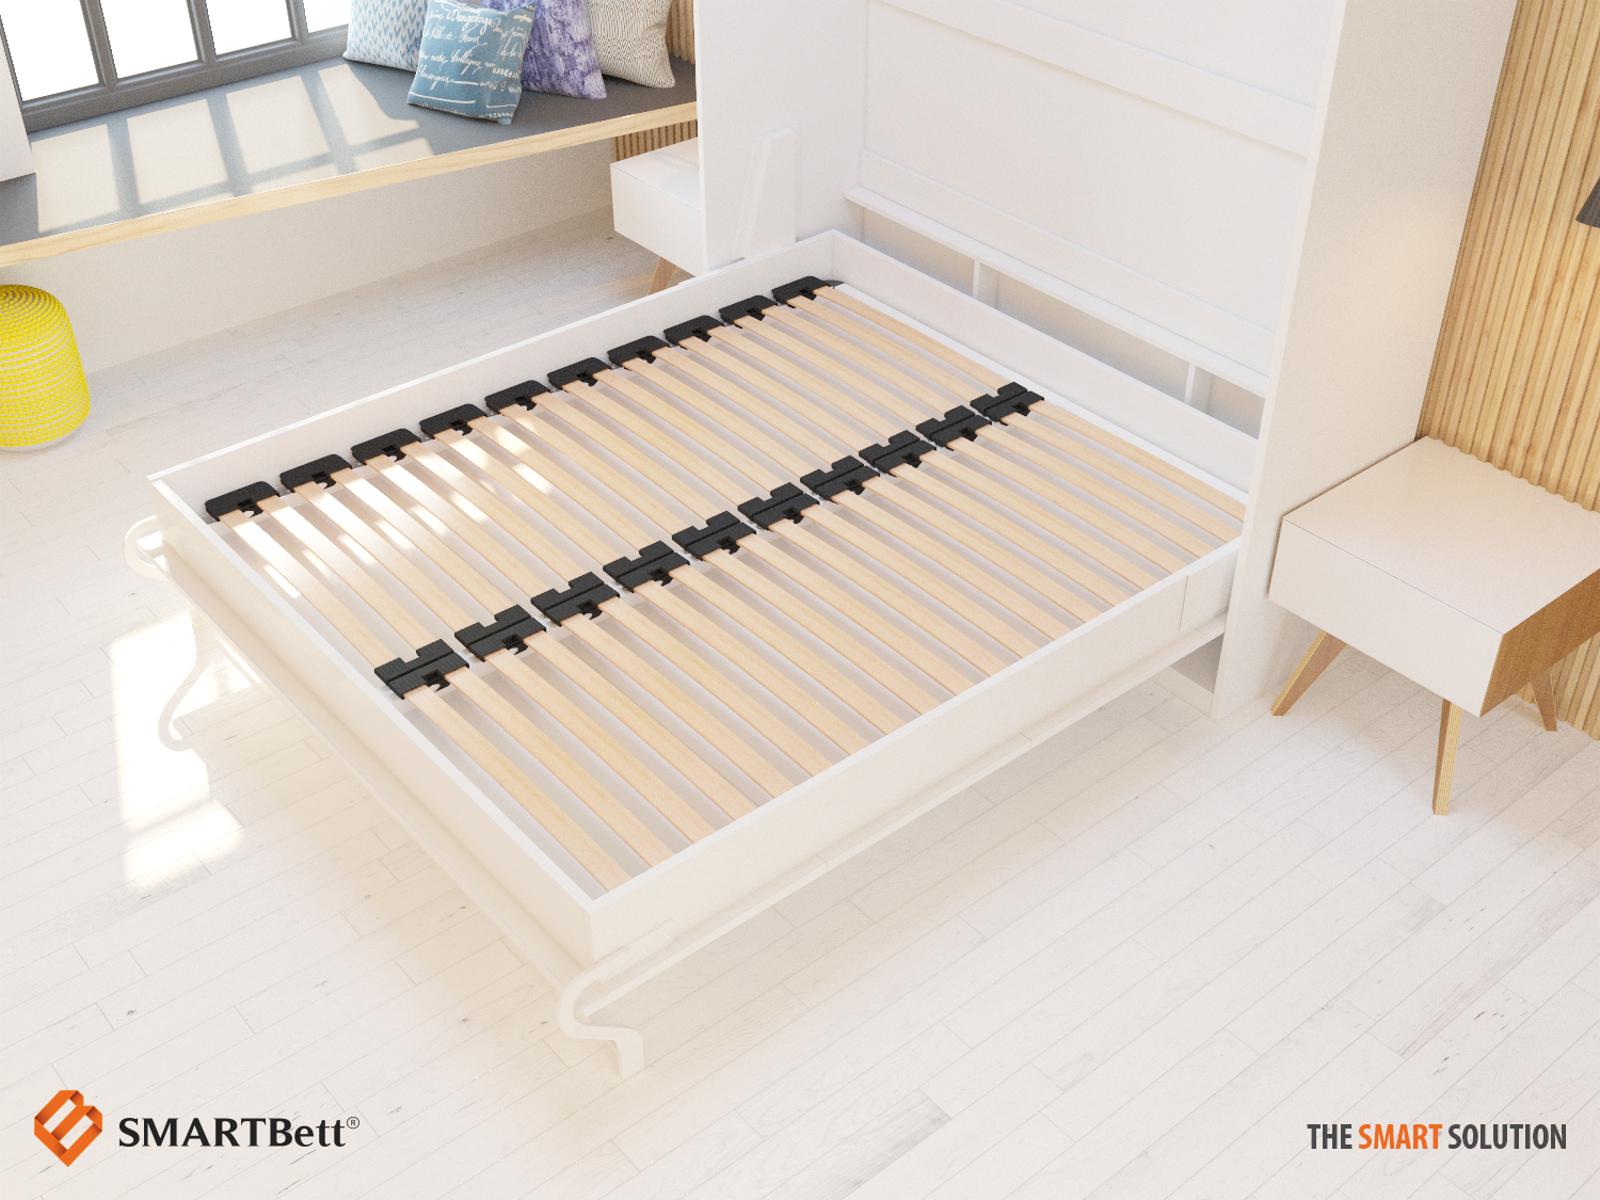 schrankbett 140x200 selber bauen bett selber bauen with. Black Bedroom Furniture Sets. Home Design Ideas